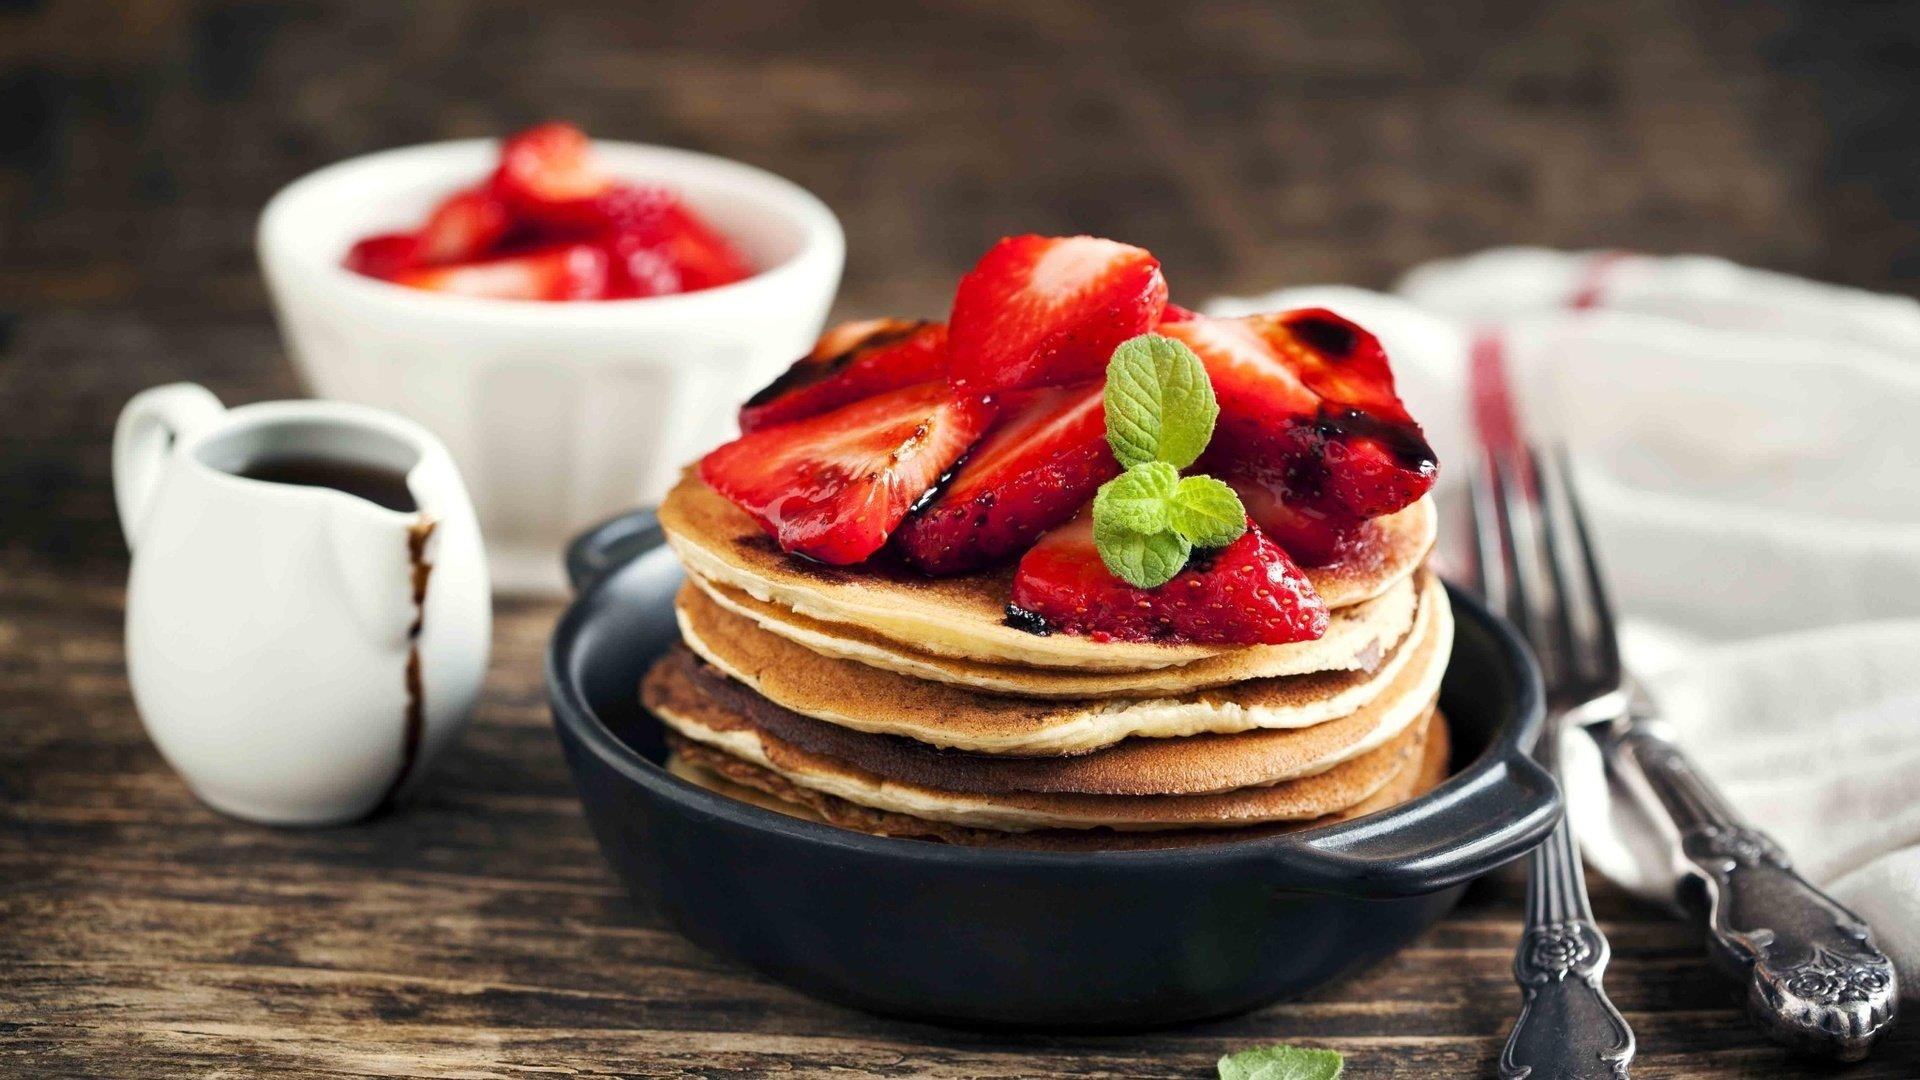 еда блины шоколад food pancakes chocolate смотреть